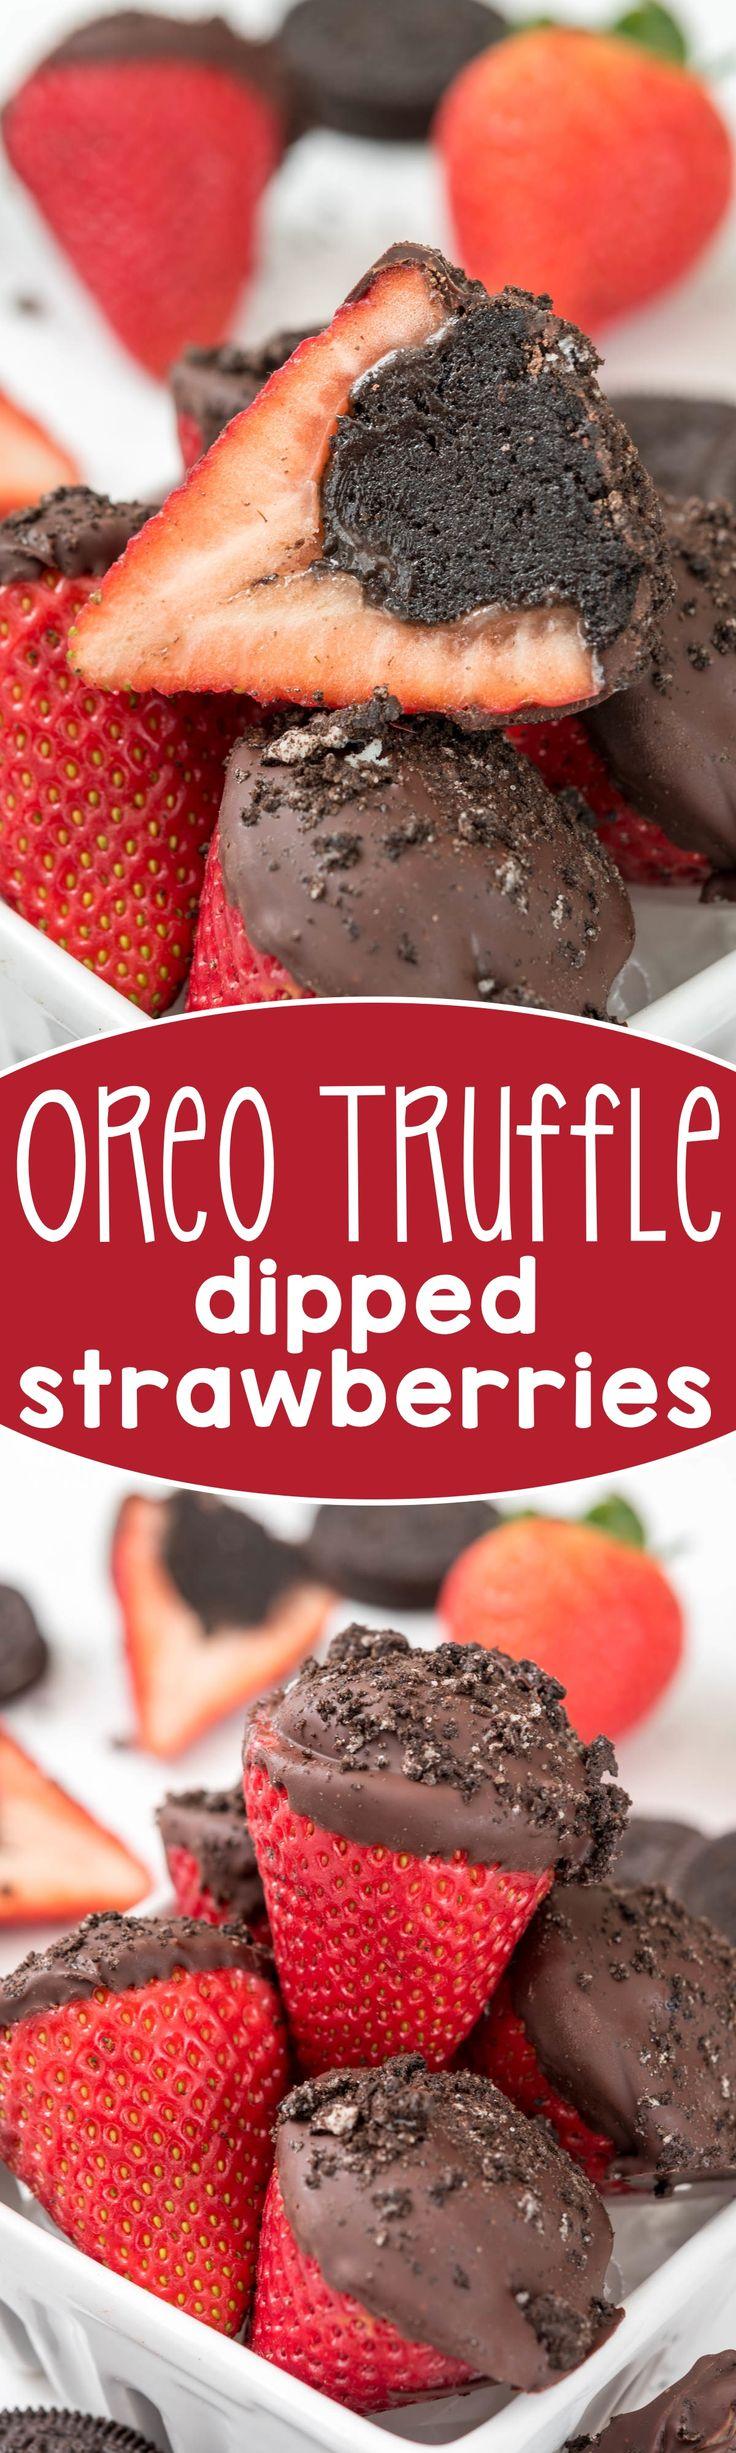 OMG! Necesito hacer estas fresas rellenas de trufas de OREO... Primero rellenas de trufas la fresa y luego la bañas en chocolate. DECADENTE y DELICIOSO Oreo Truffle Dipped Strawberries - an easy treat for the one you love! Stuff strawberries with an Oreo truffle before you dip - genius!